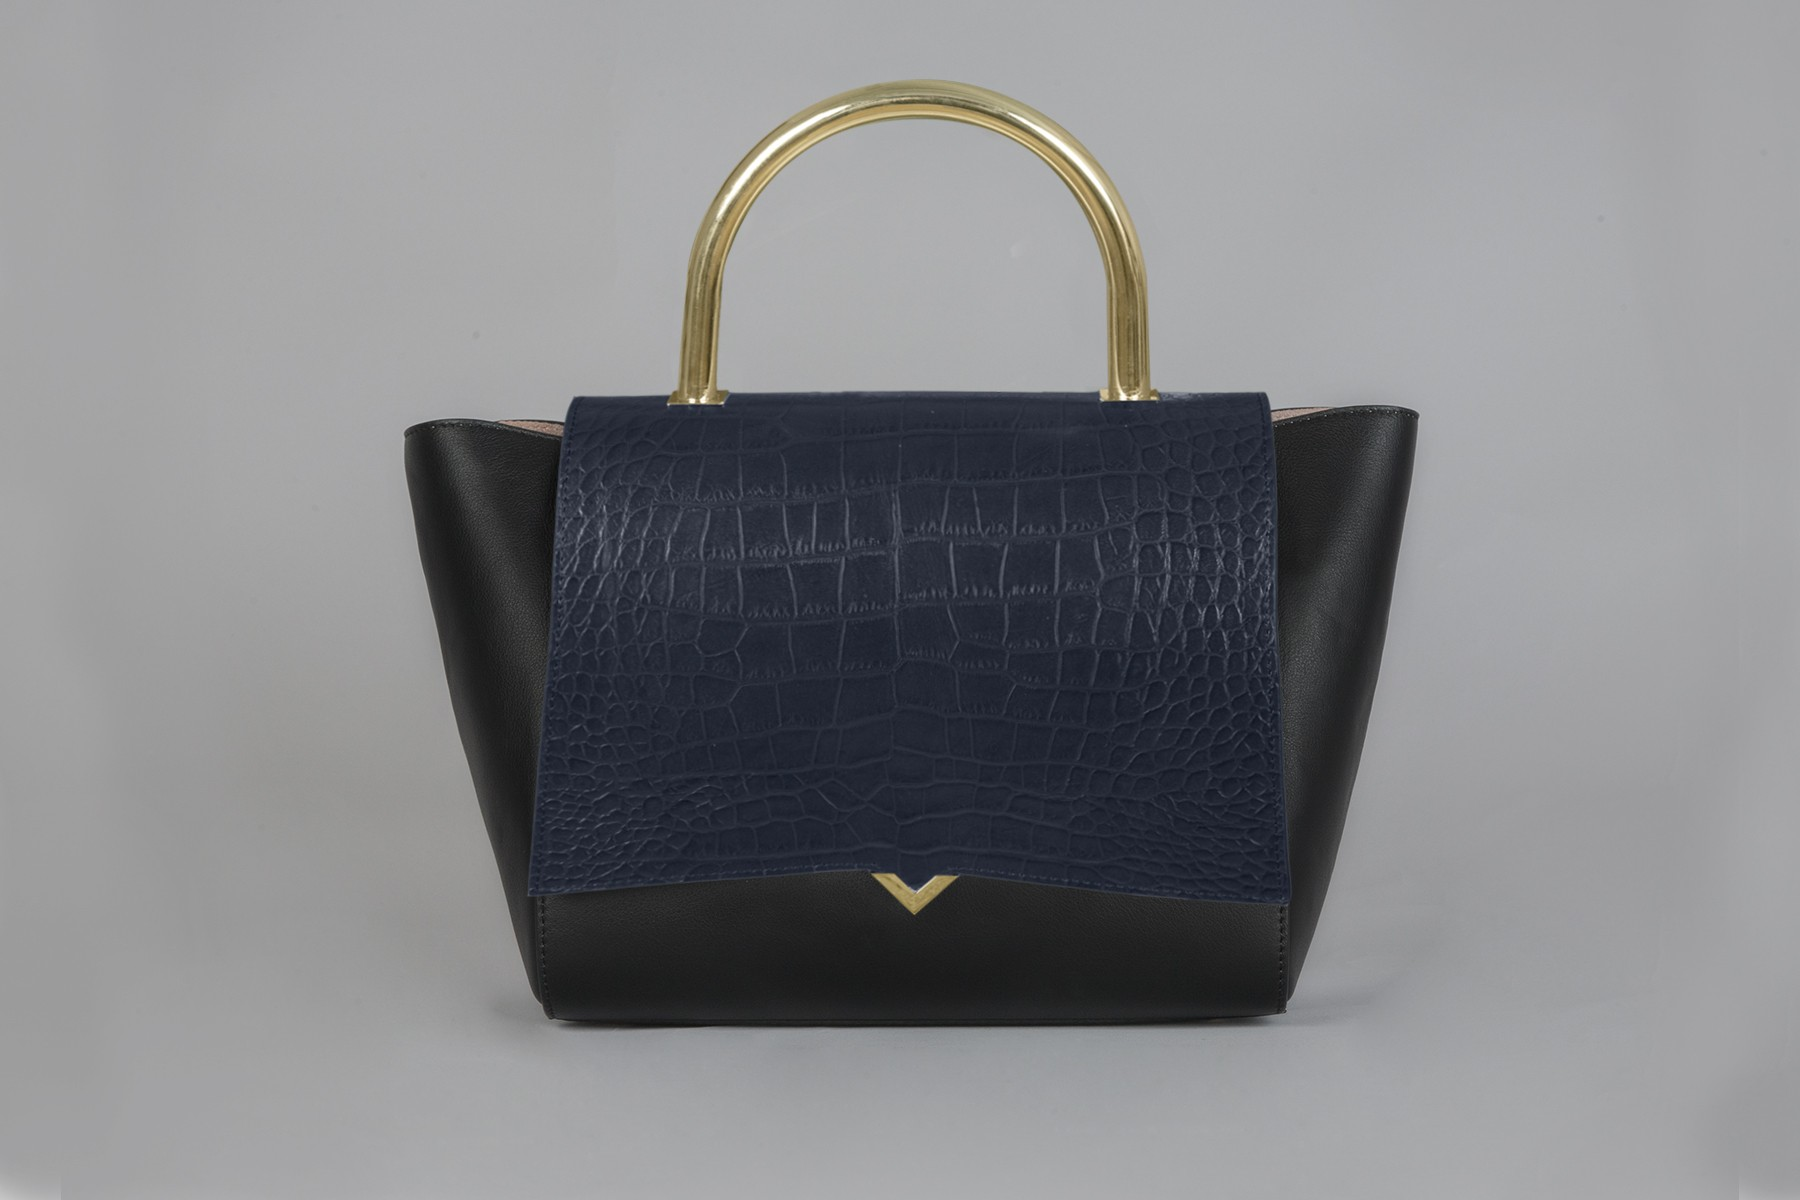 Paris - Cover croco navy blue